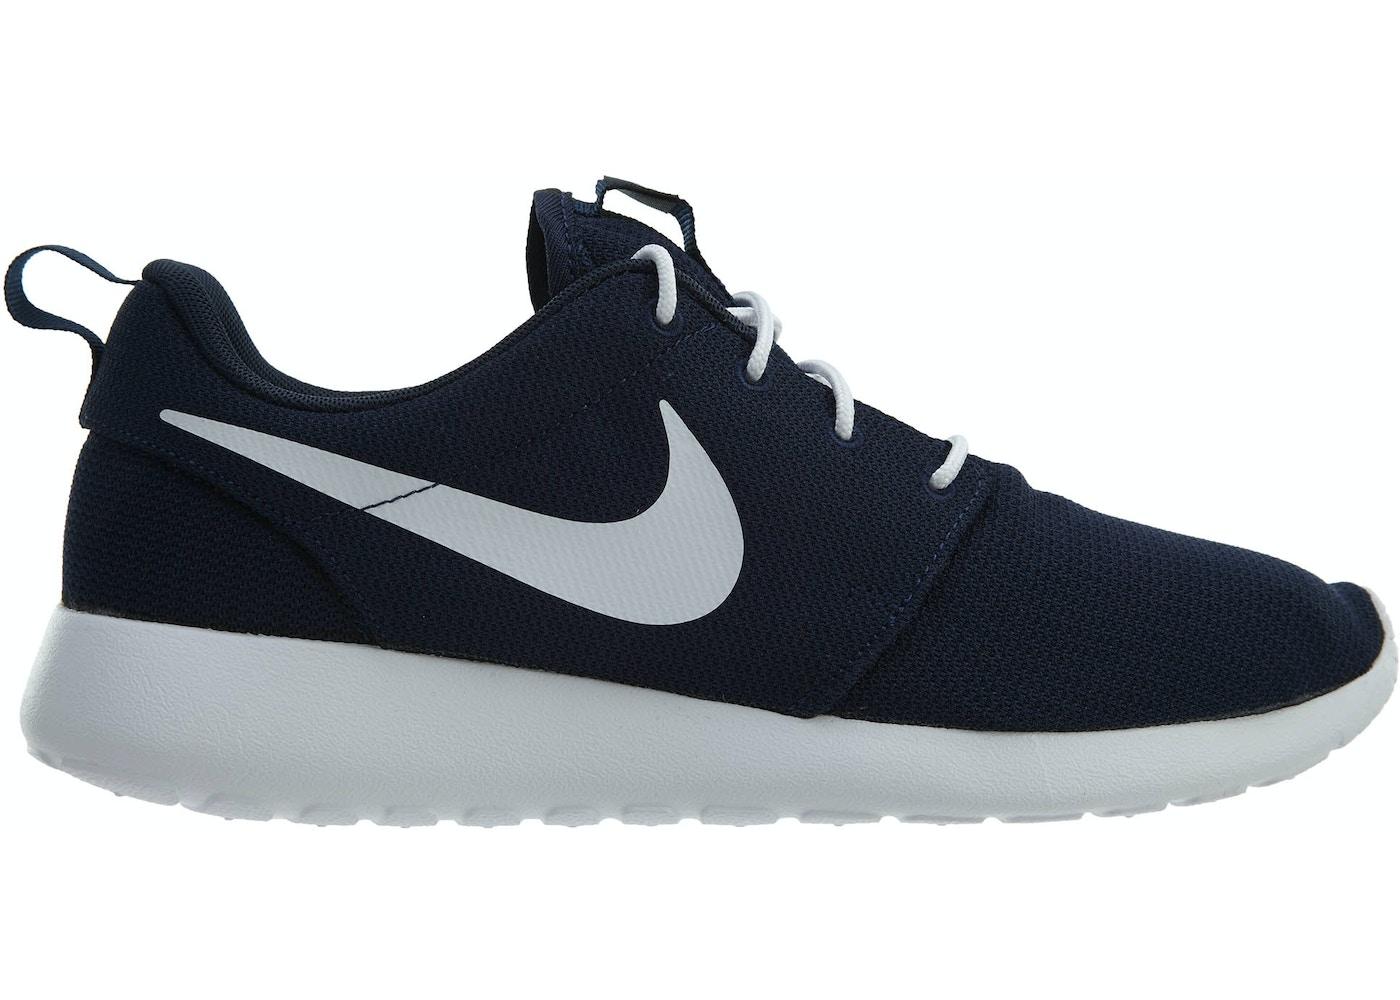 0f198072e3f3 Nike Roshe One Obsidian White - 511881-423